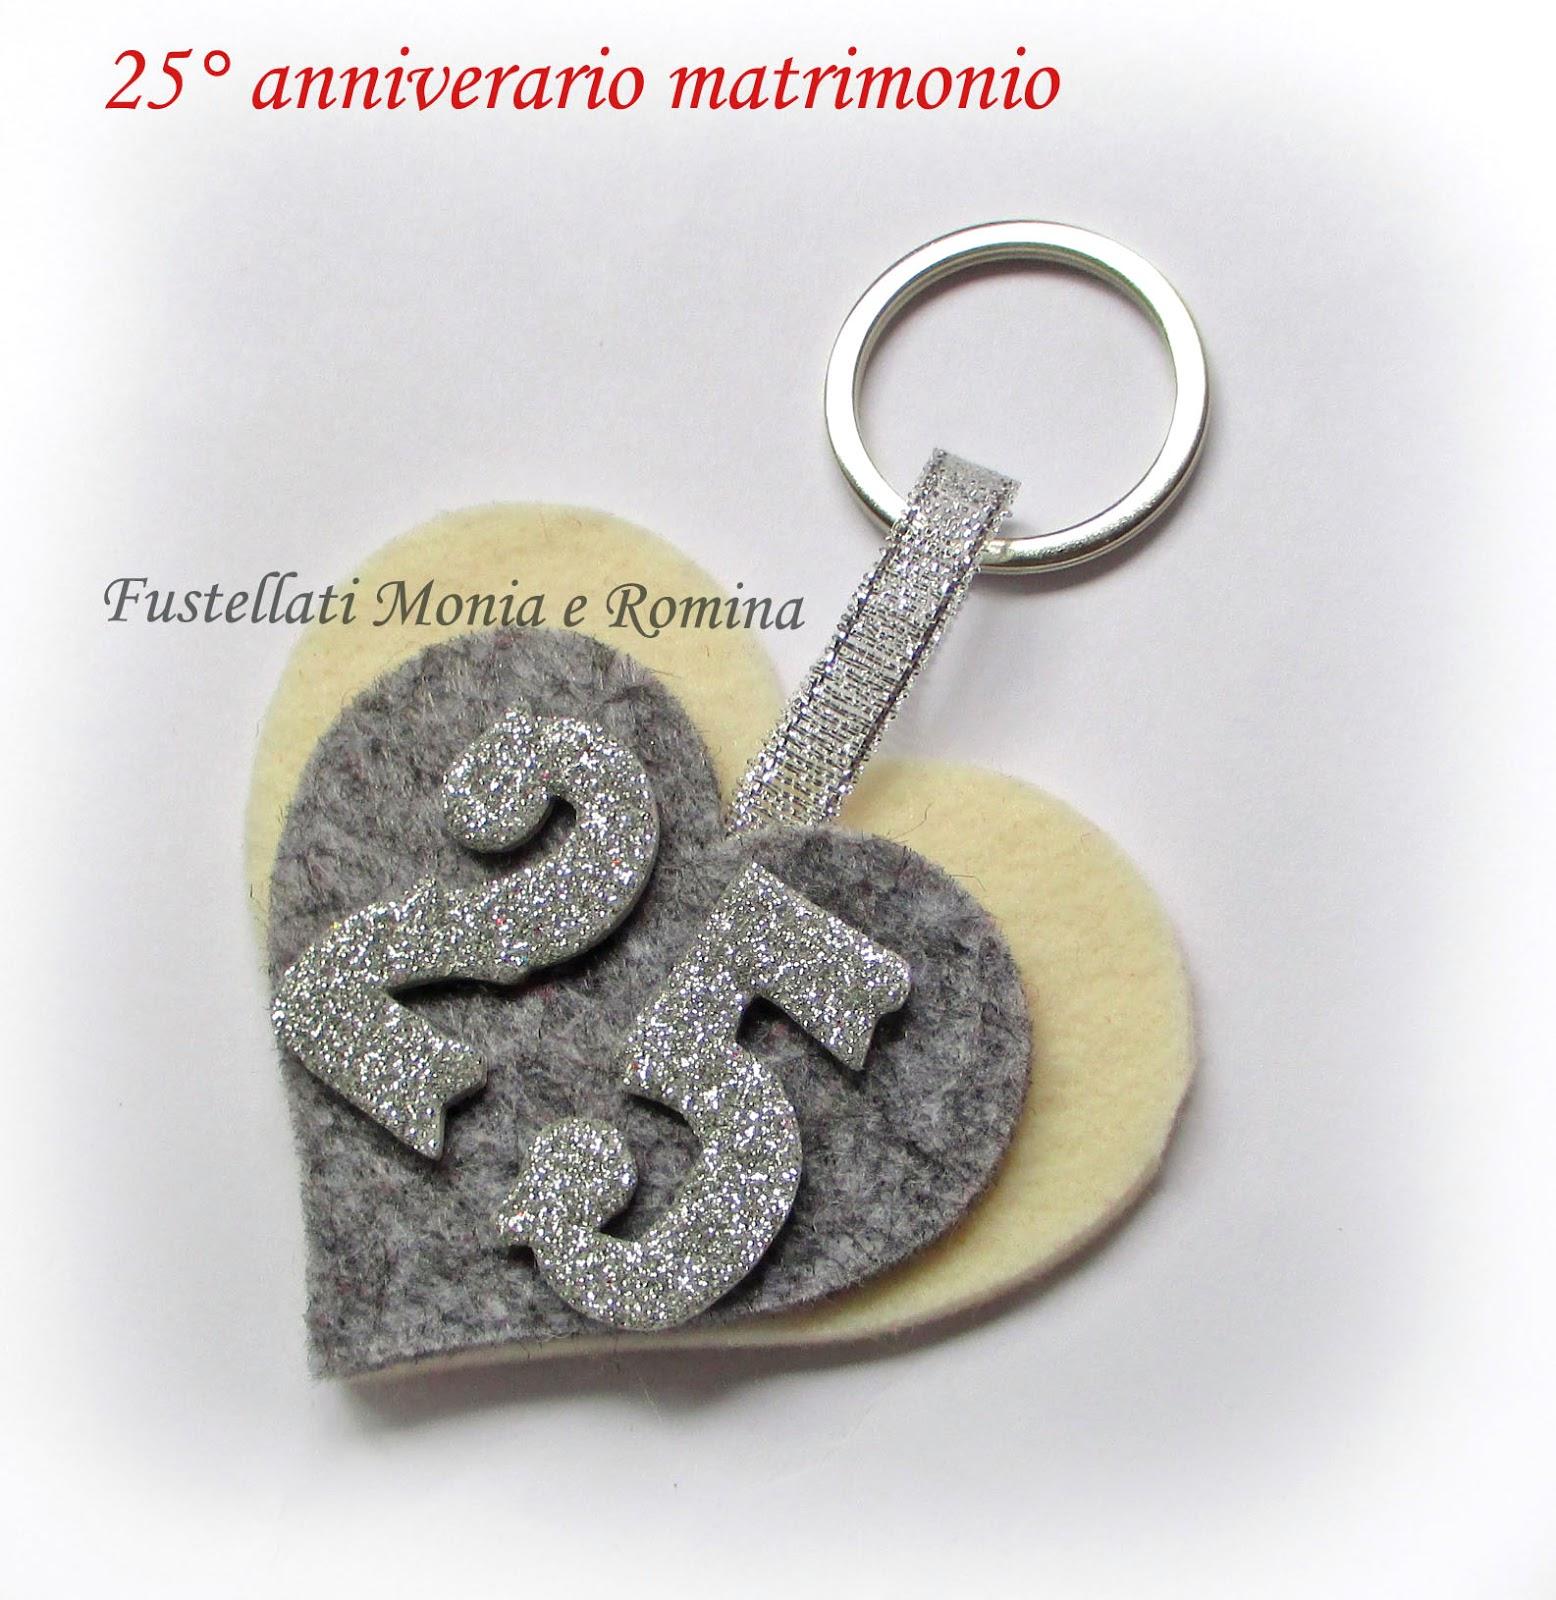 Segnaposti 50 anni di matrimonio ny52 regardsdefemmes for Video anniversario 25 anni di matrimonio